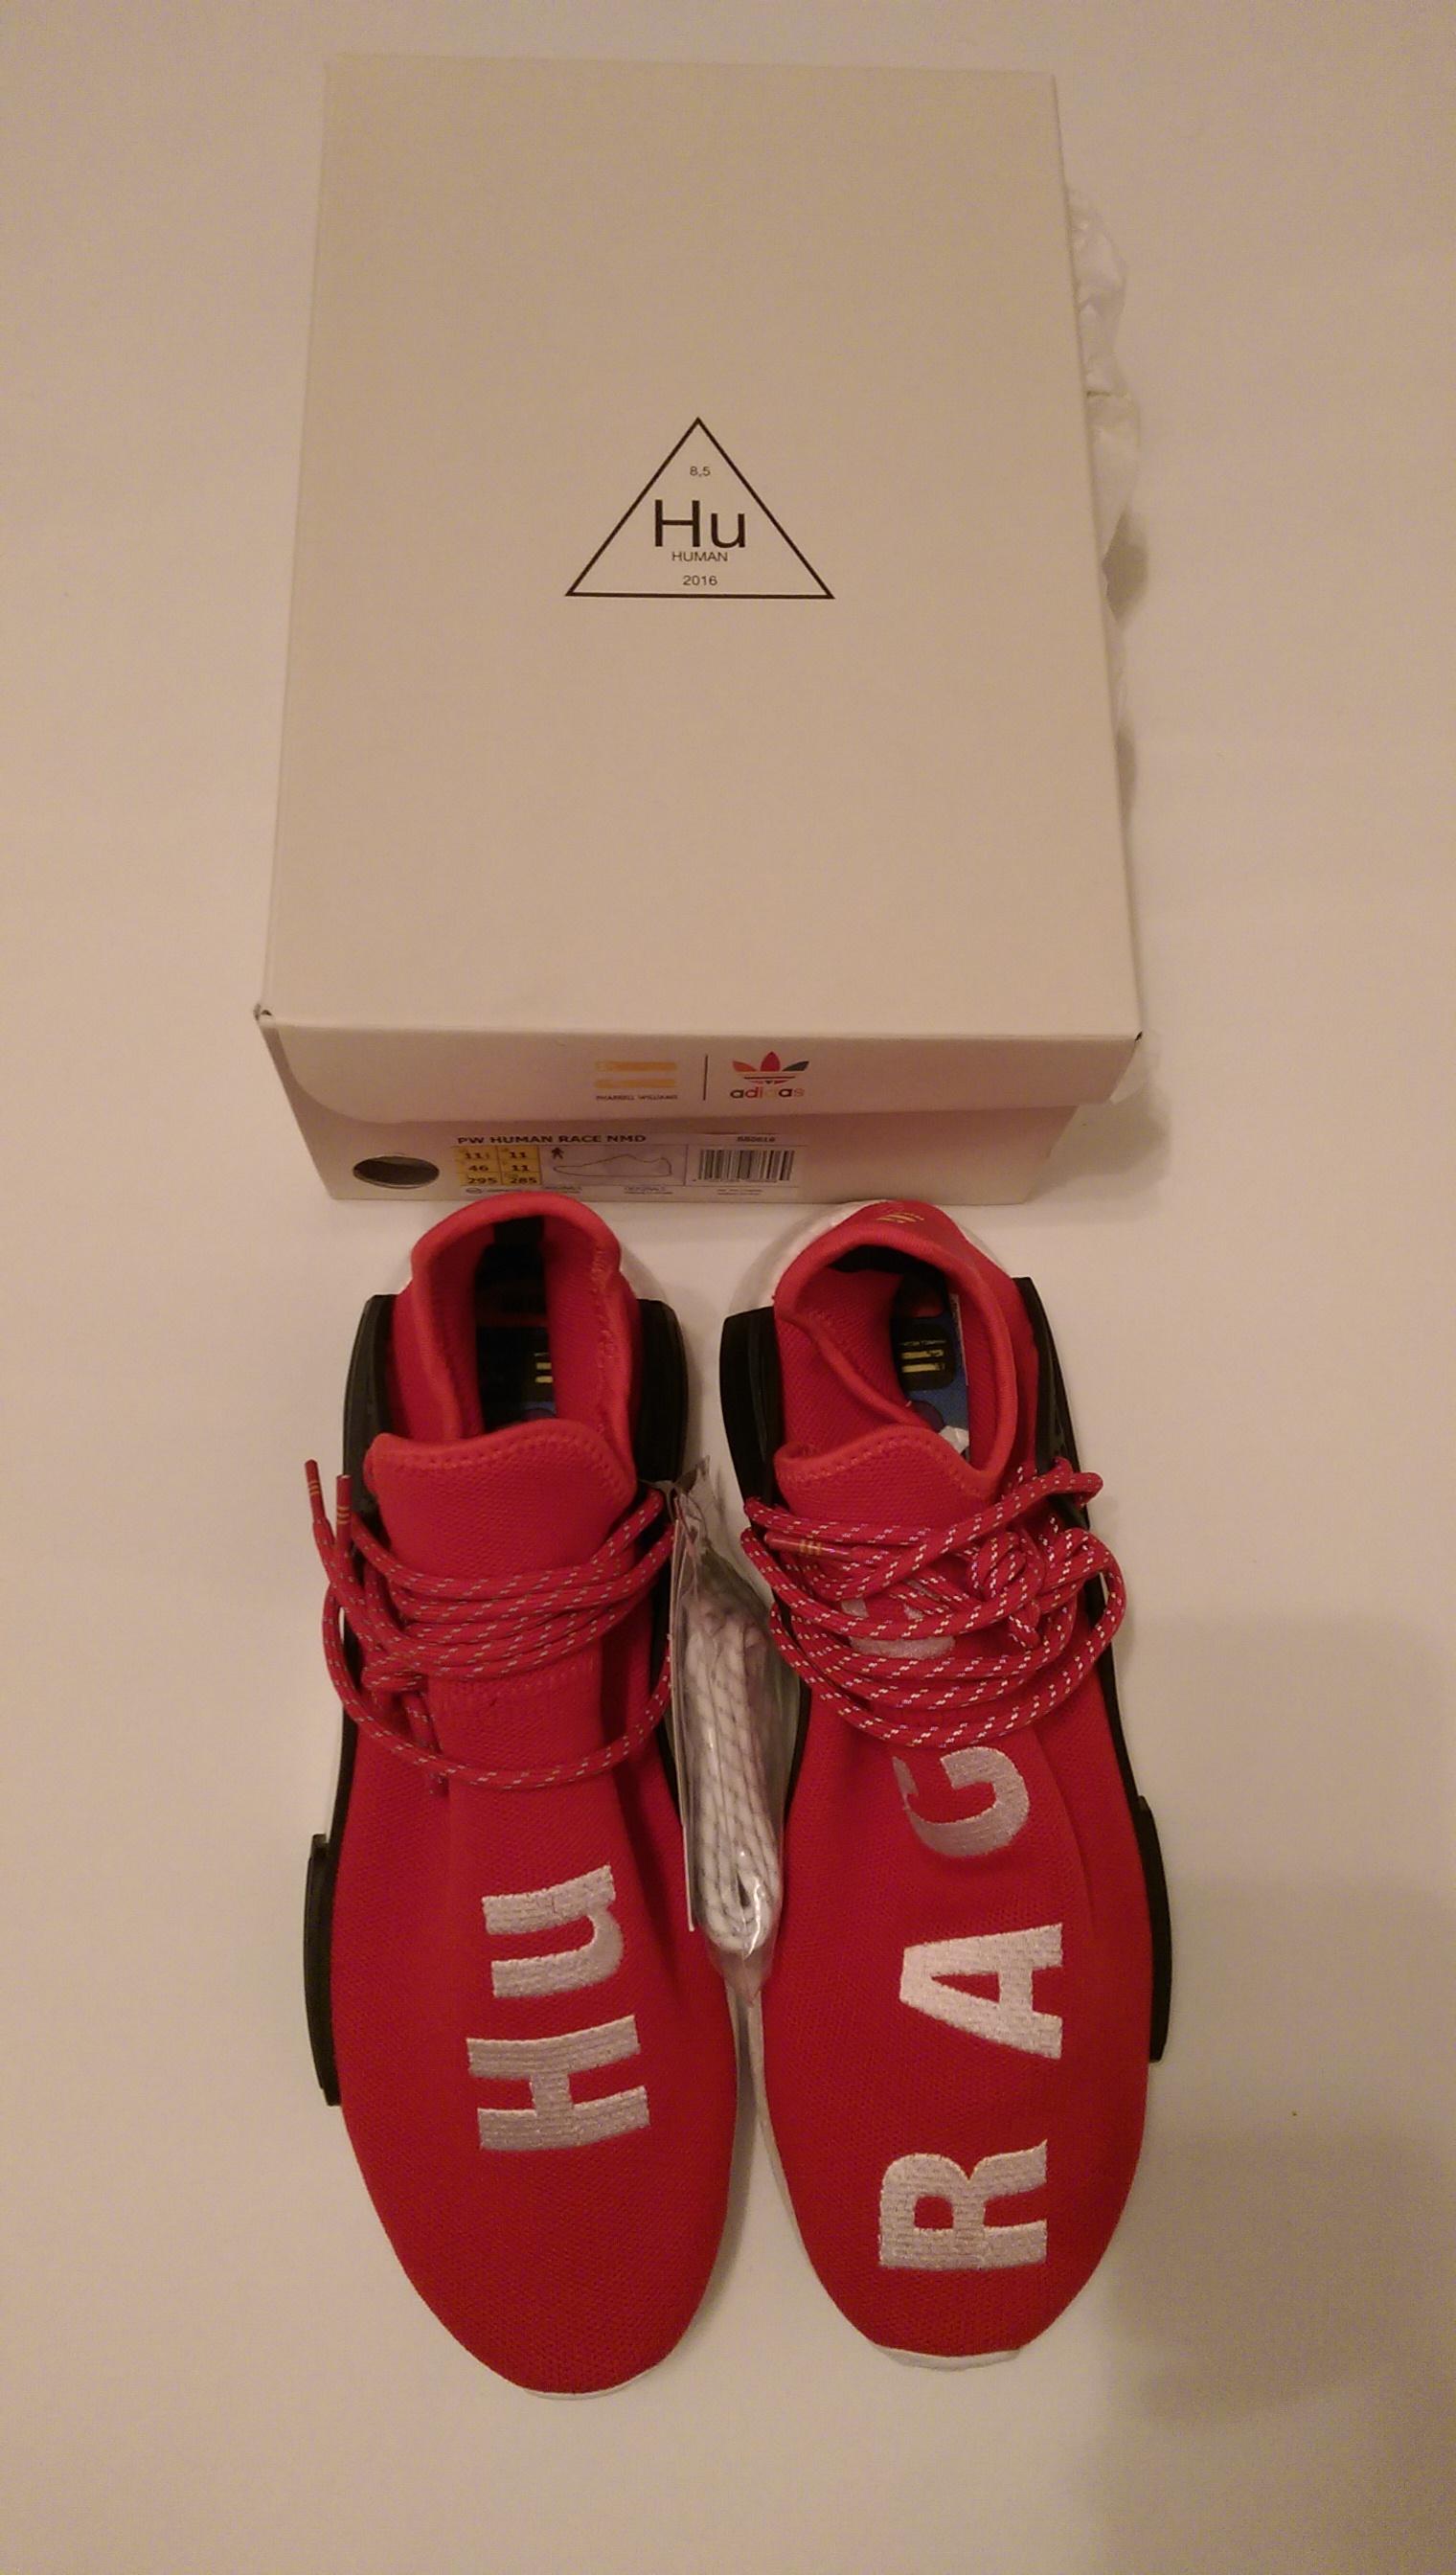 61d5ce47d60bc Adidas × Pharrell ×. Adidas NMD Pharrell HU Human Race Scarlet Red